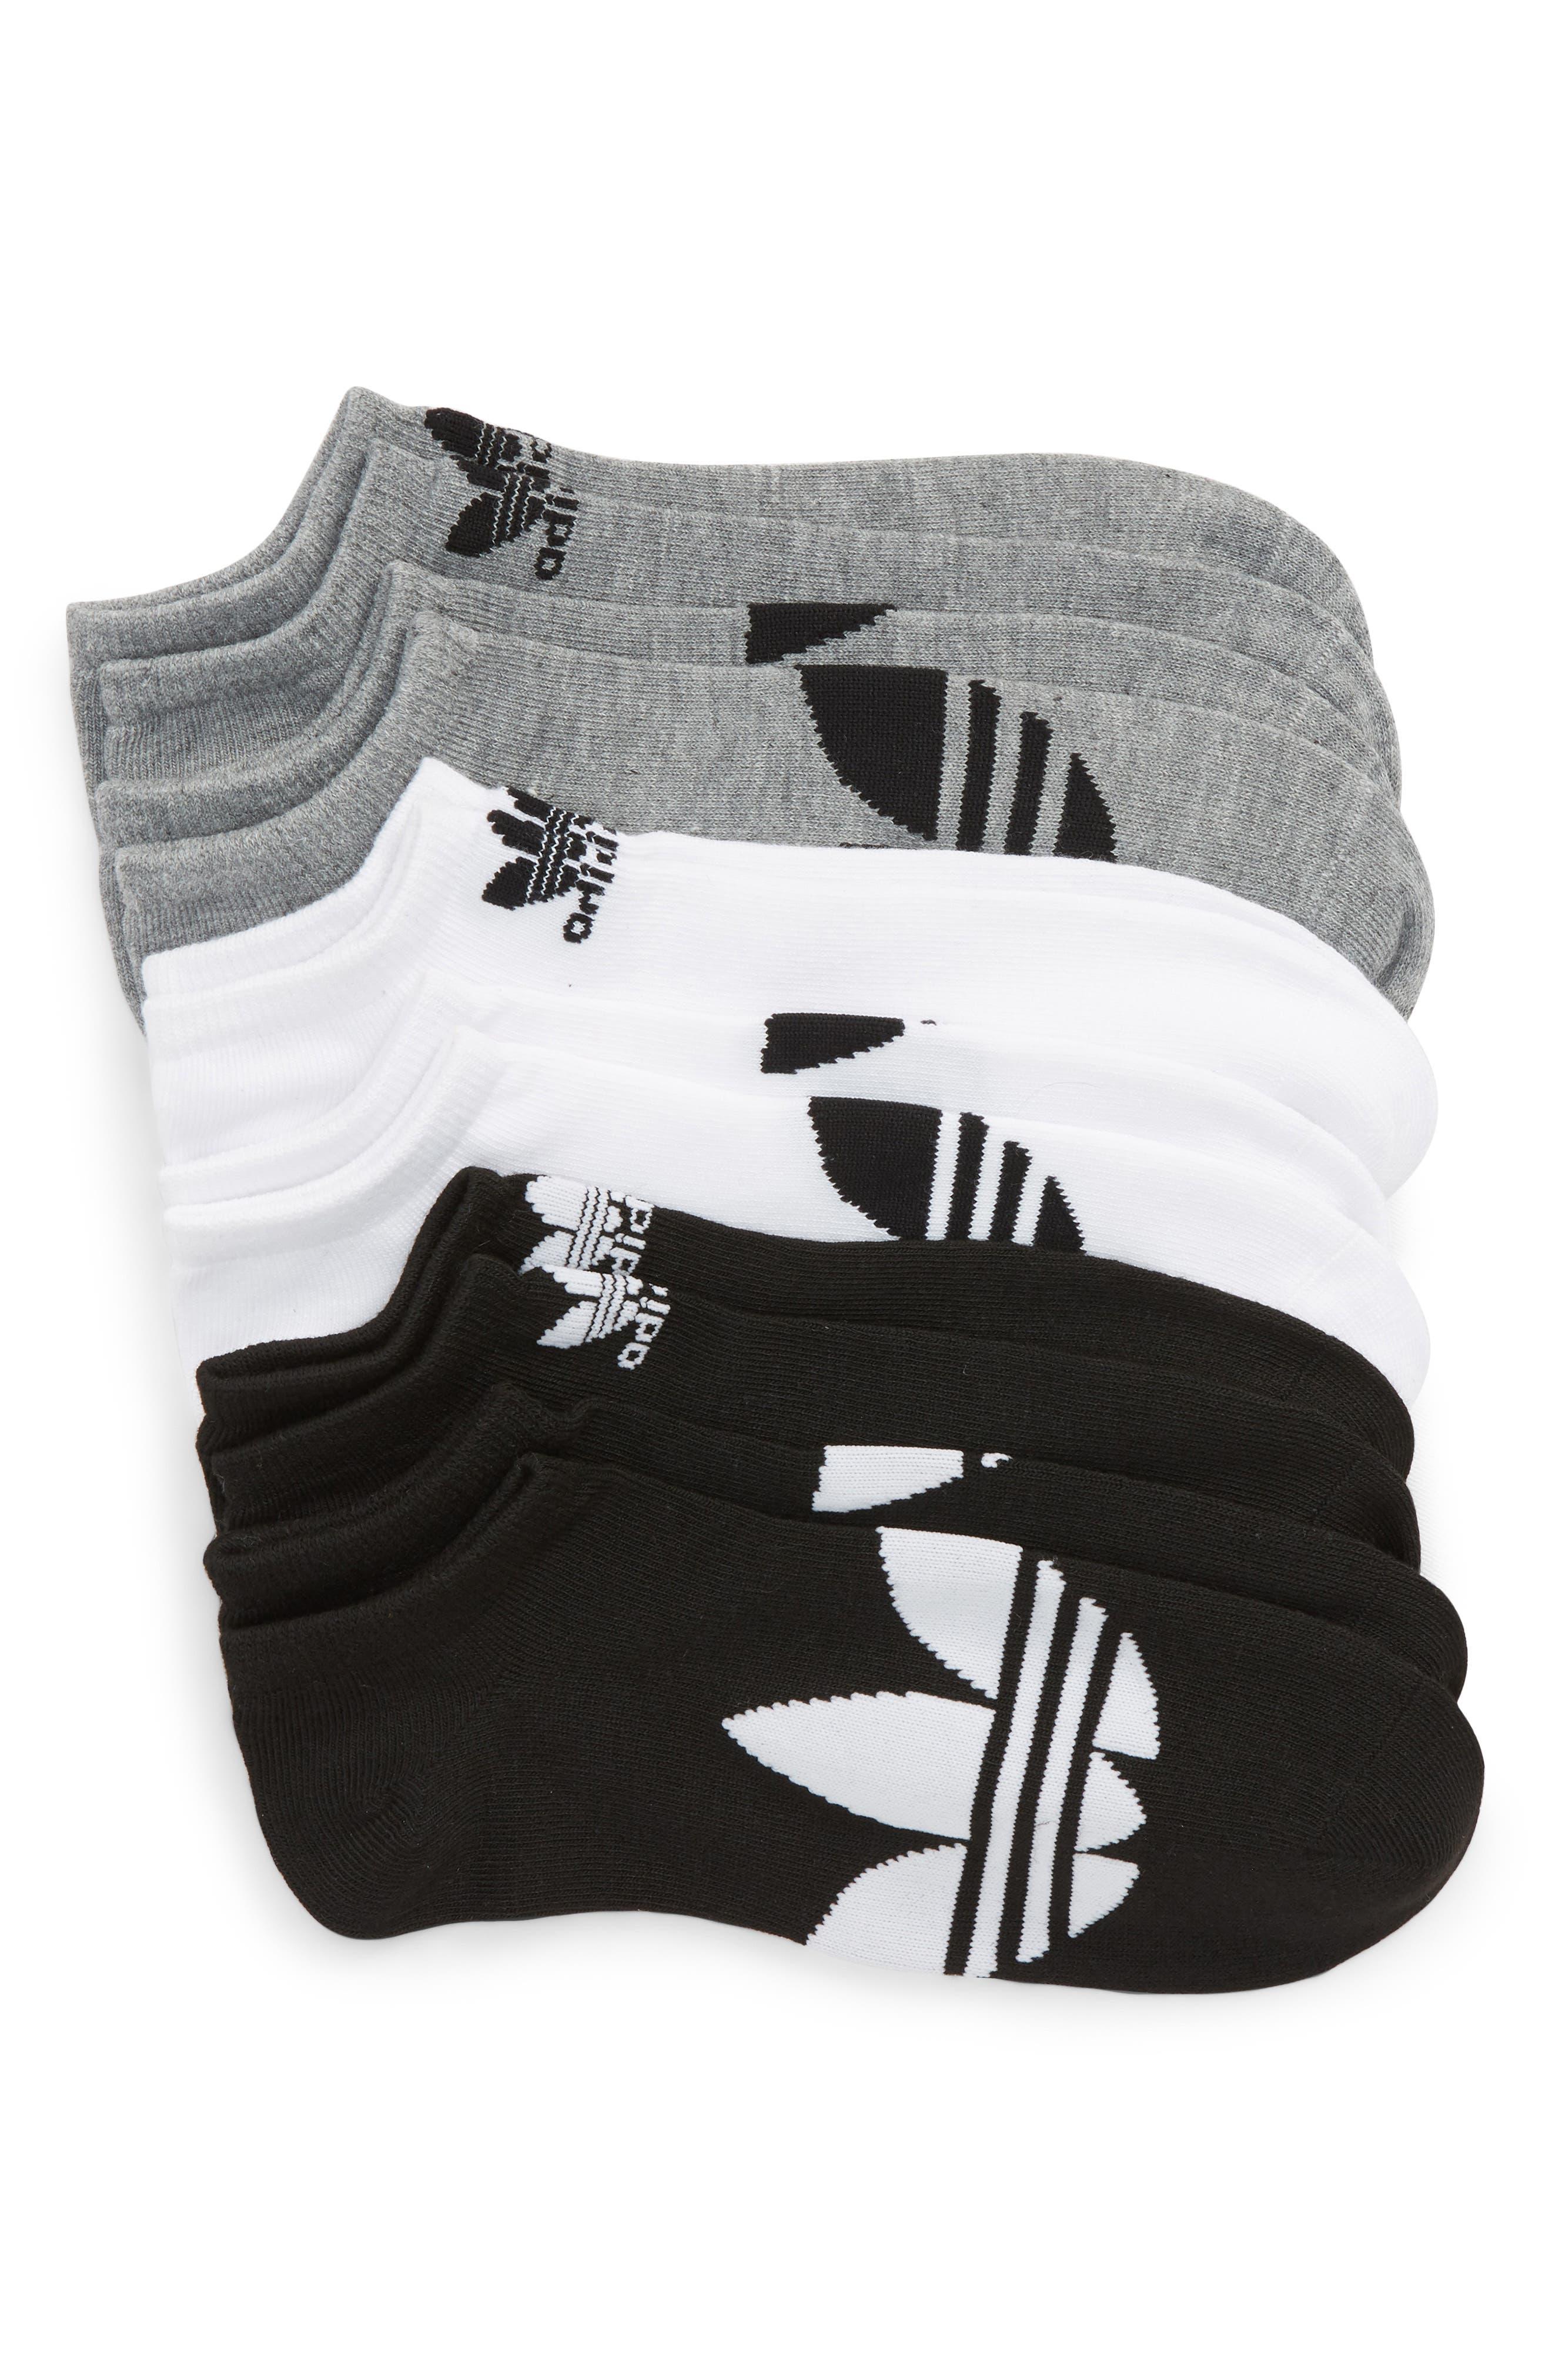 6-Pack No-Show Socks,                             Main thumbnail 1, color,                             BLACK/ WHITE/ HEATHER GREY